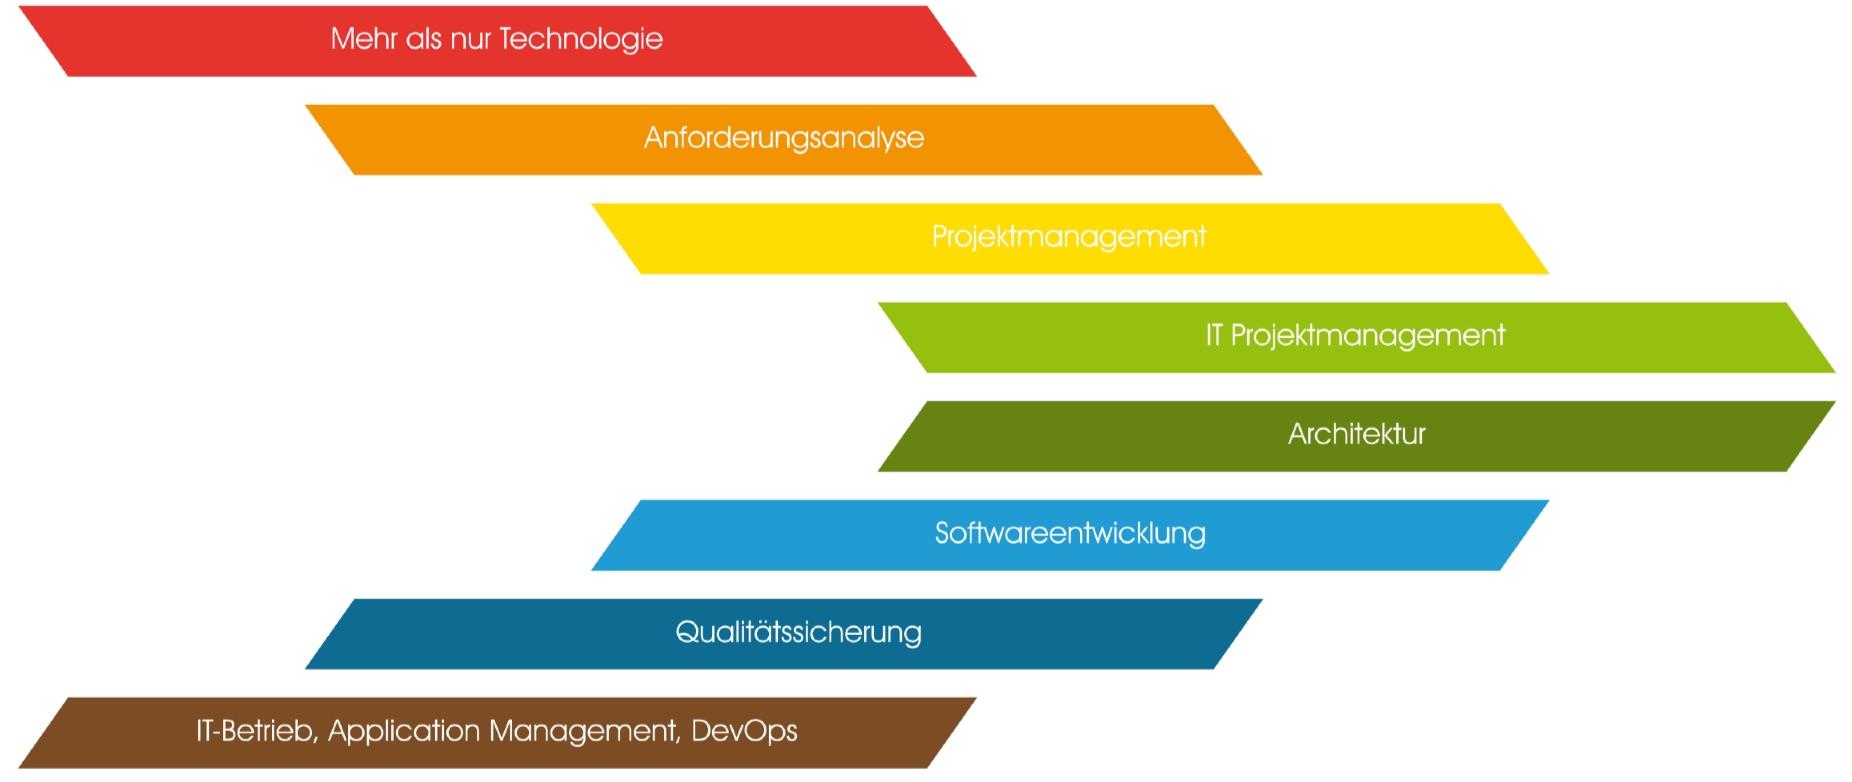 zaunberg_entwicklung